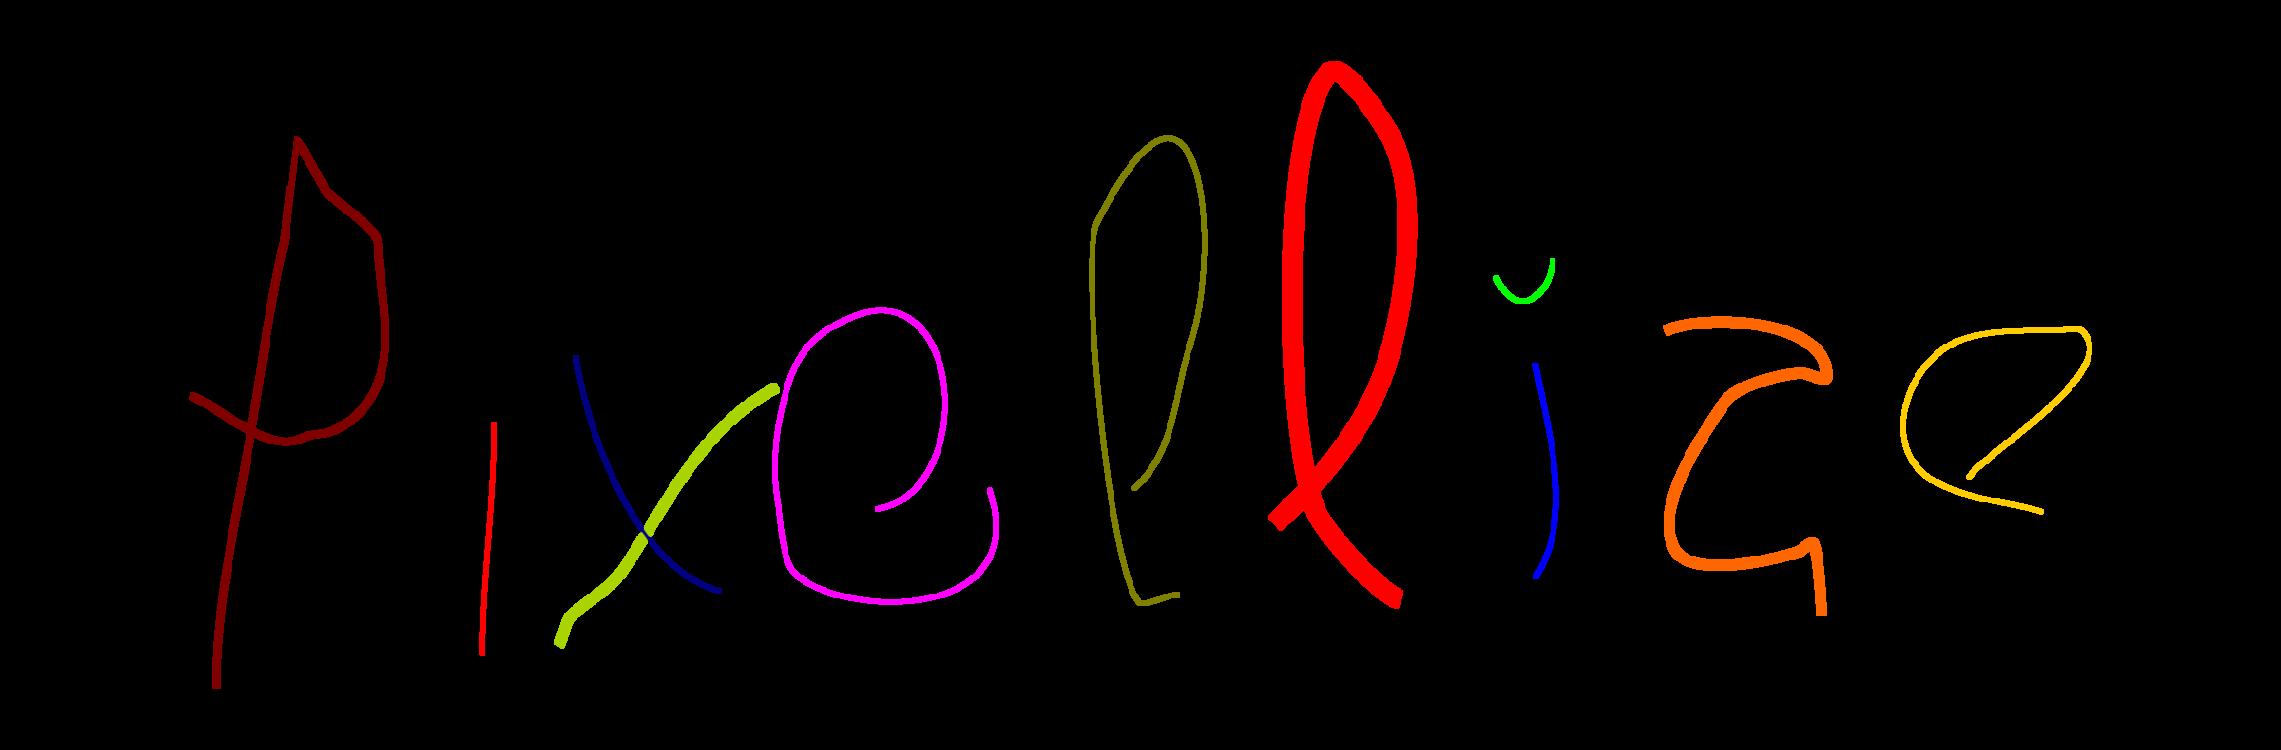 Line Art,Angle,Diagram